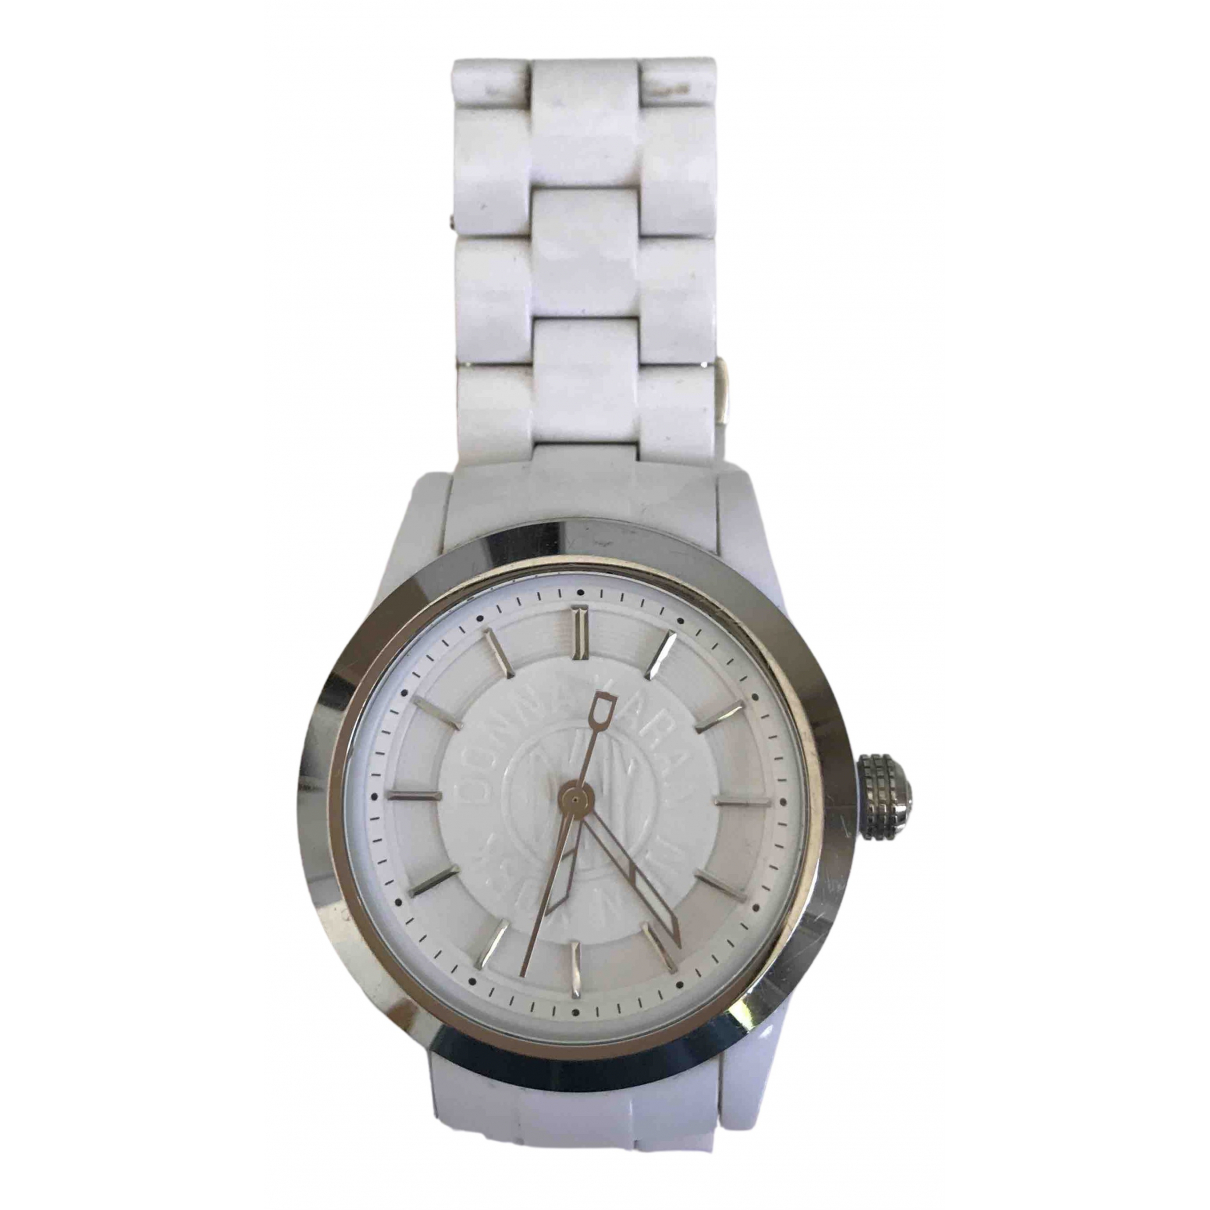 Dkny \N Uhr in  Weiss Stahl